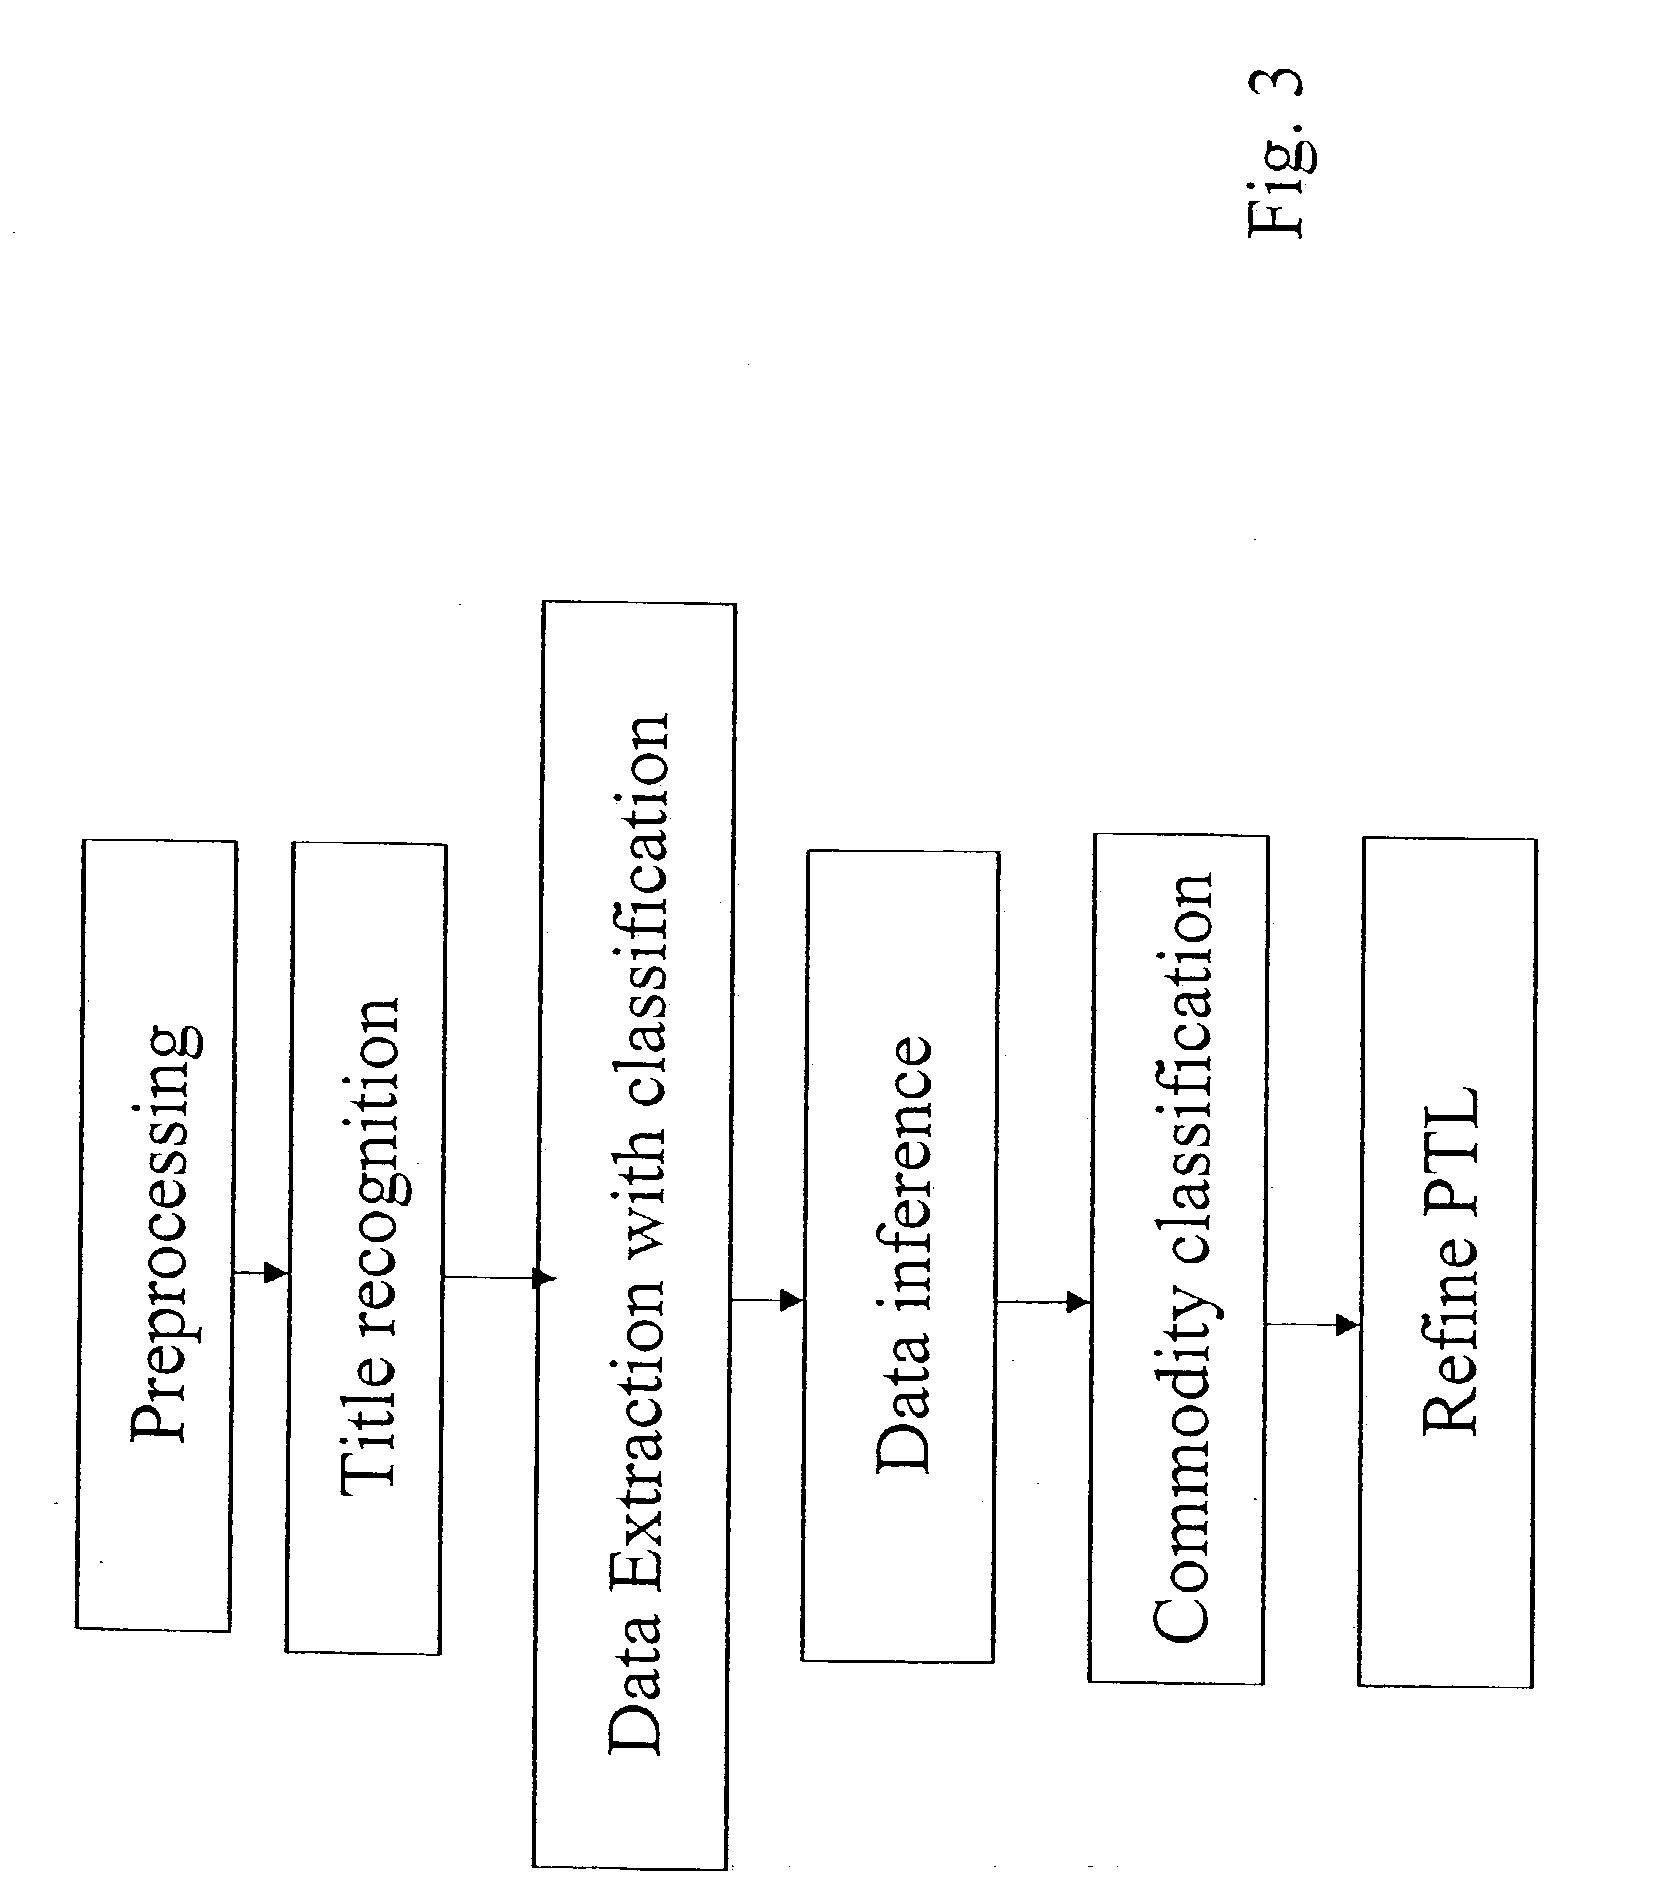 Patent US 20030217052A1